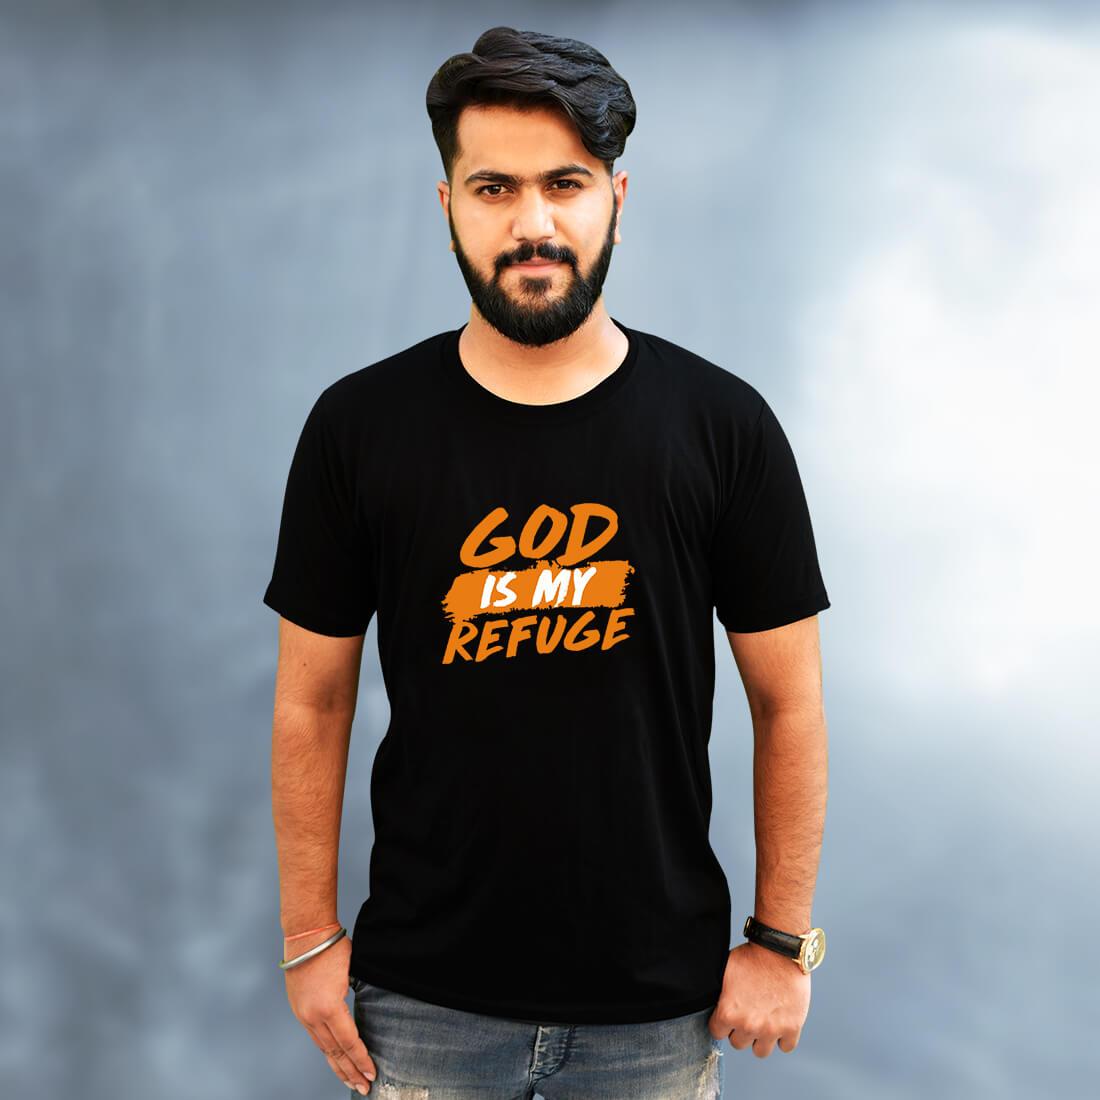 God is My Refuge Printed Black Colour T-Shirt